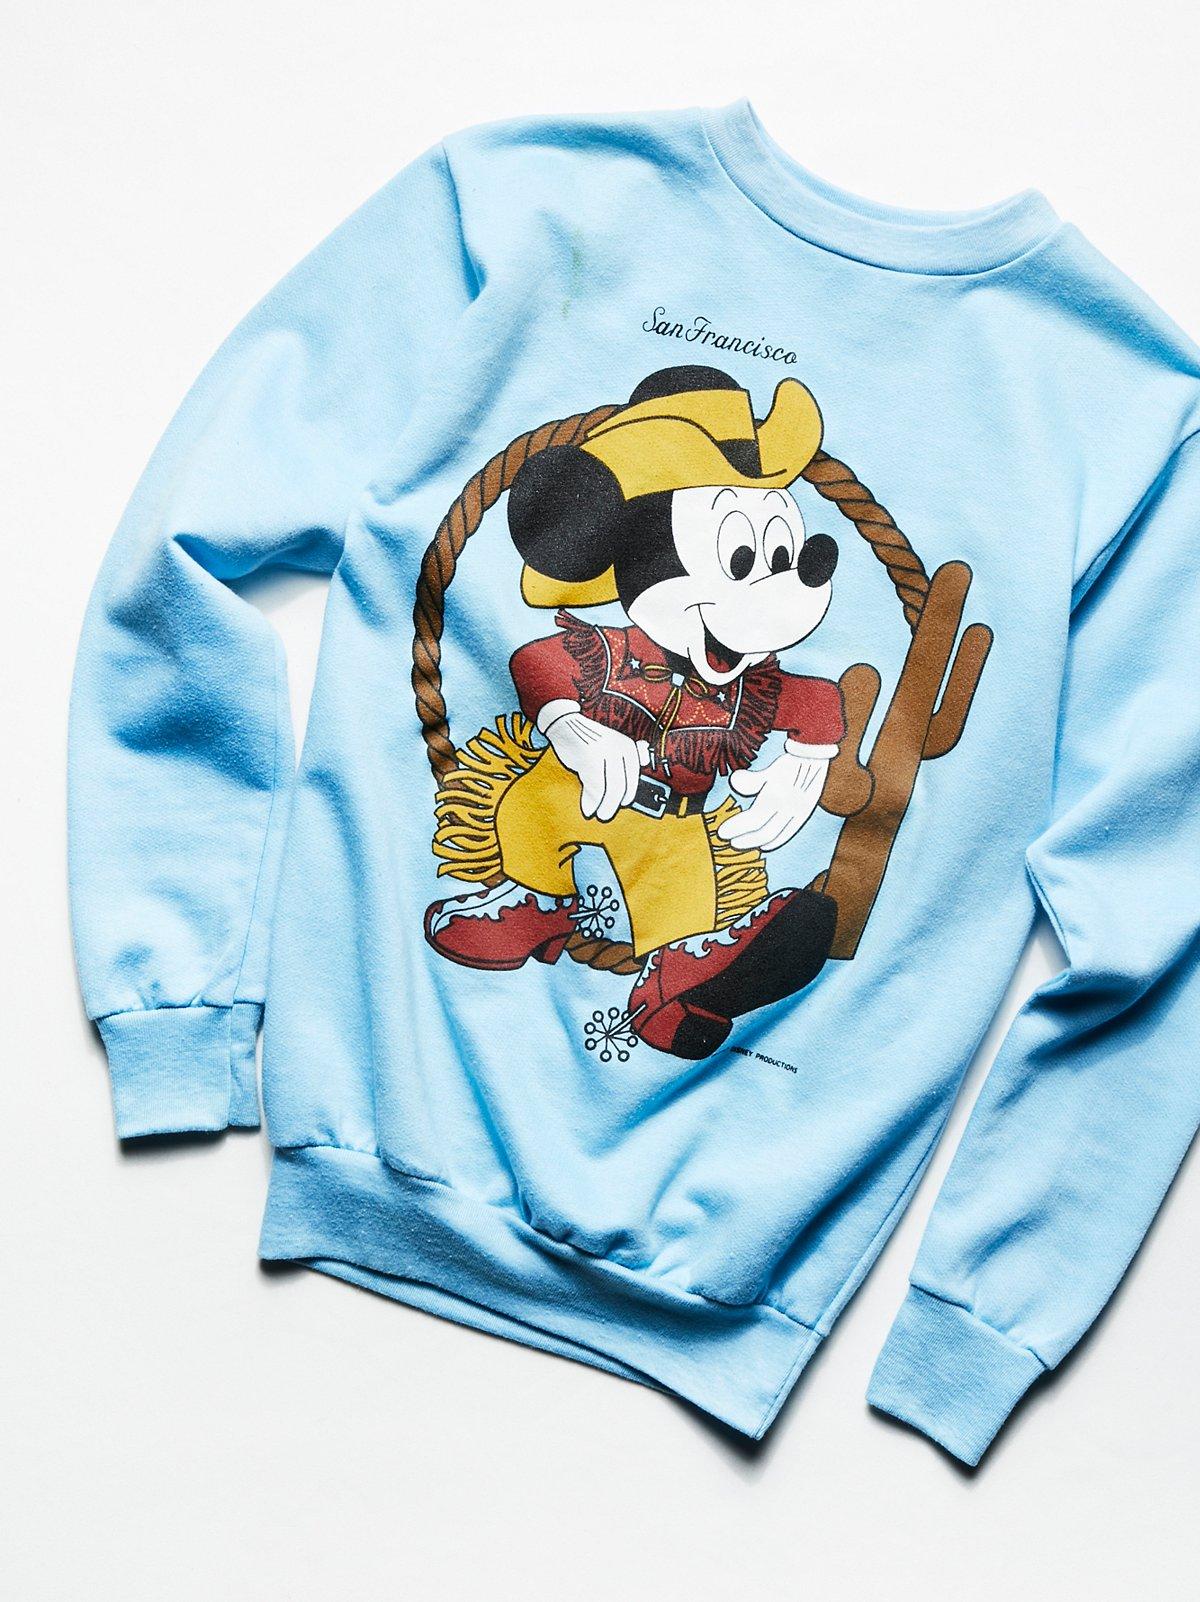 Vintage 1970s Mickey Mouse Sweatshirt